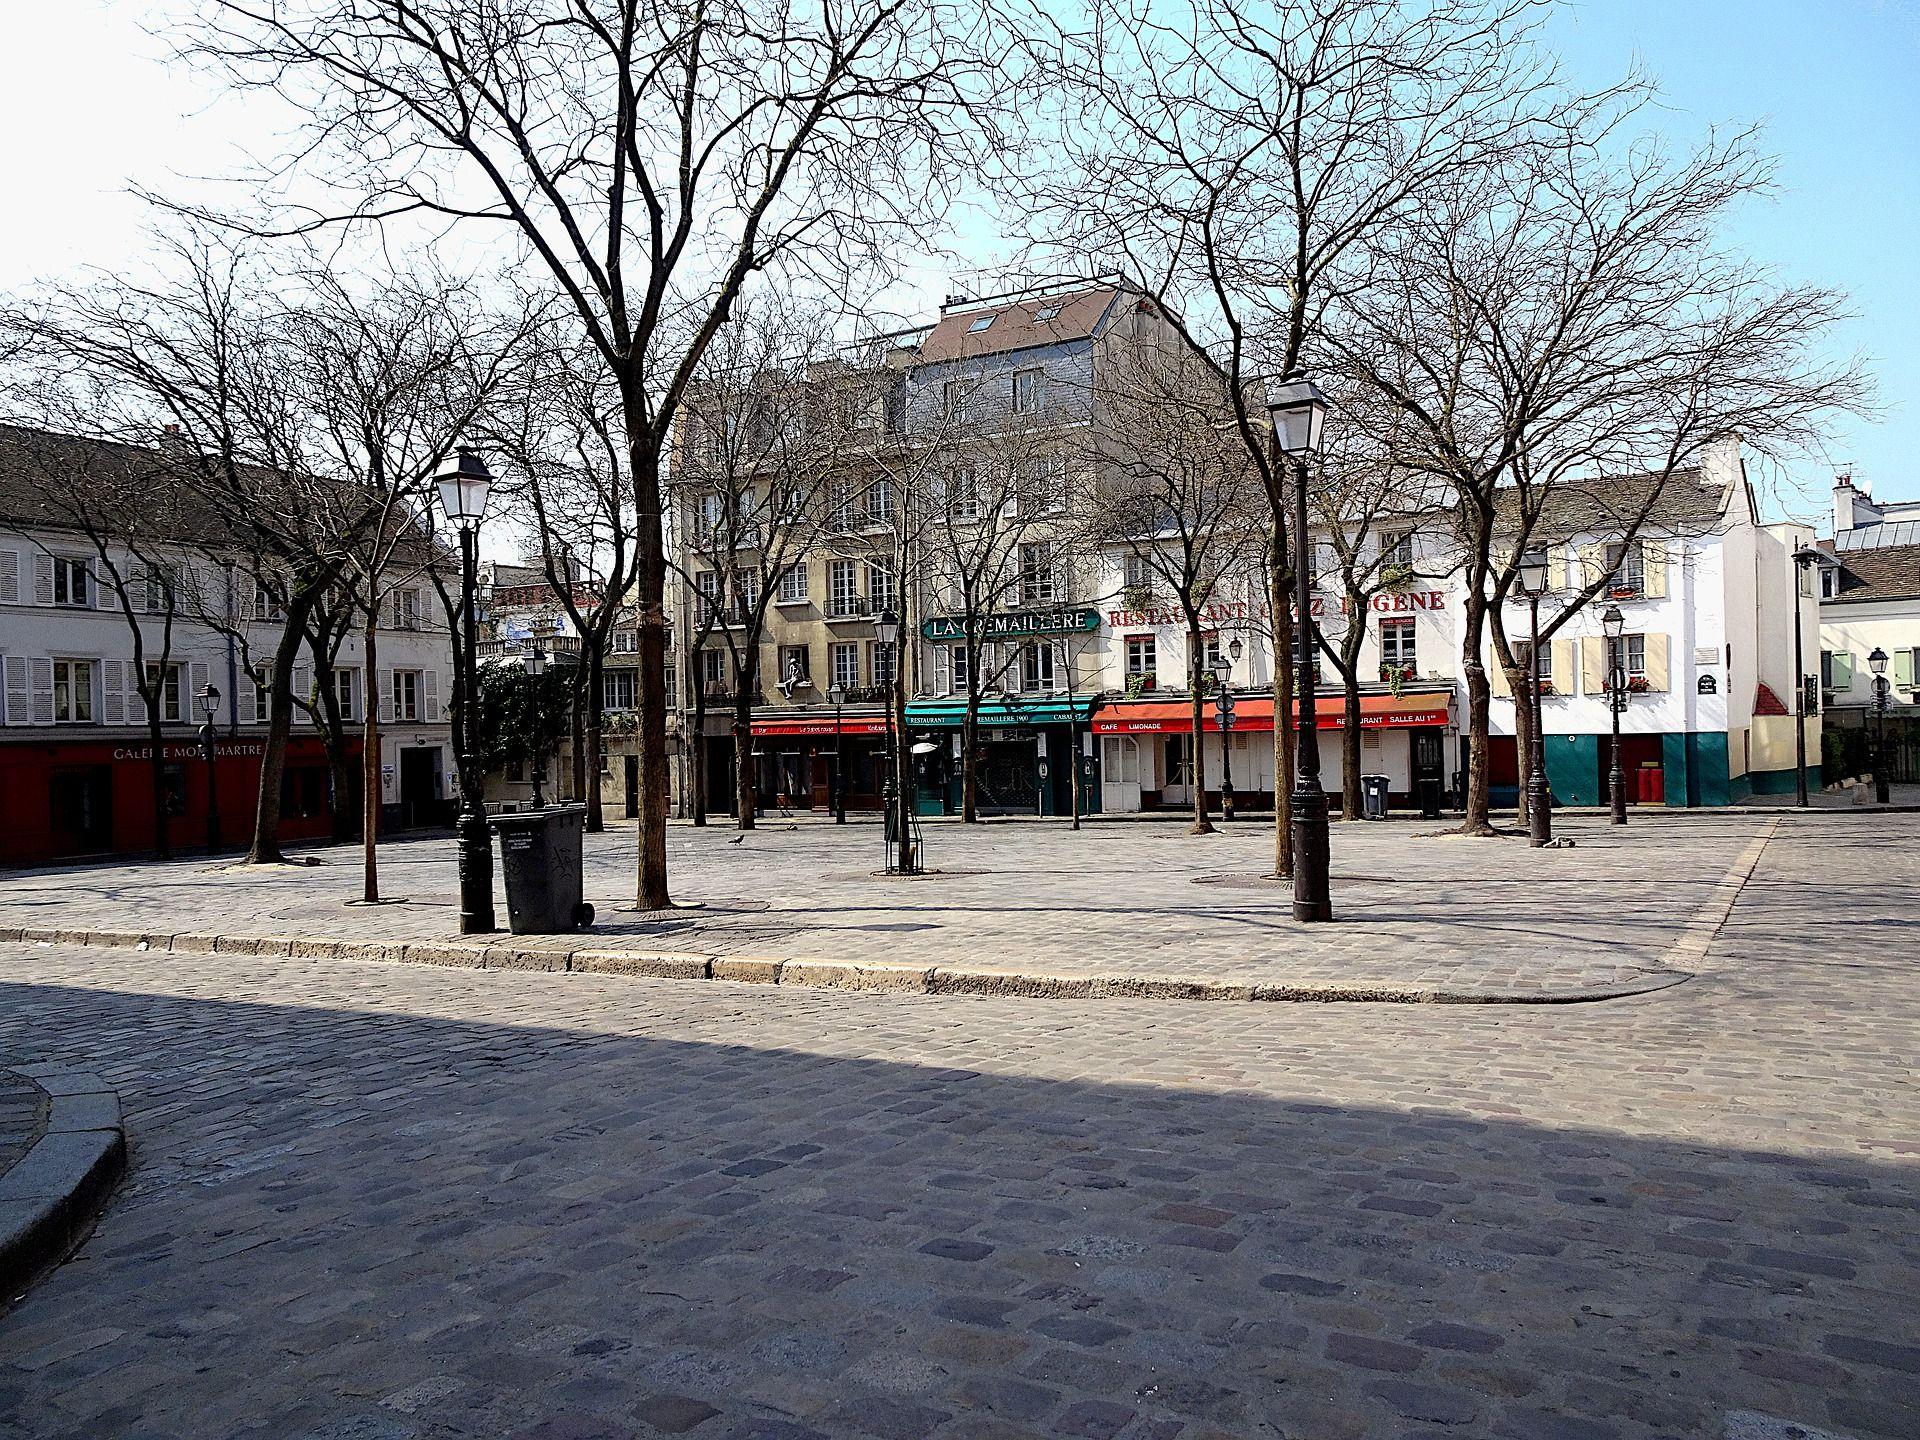 Hotel-pavillon monmartre-visiter-8